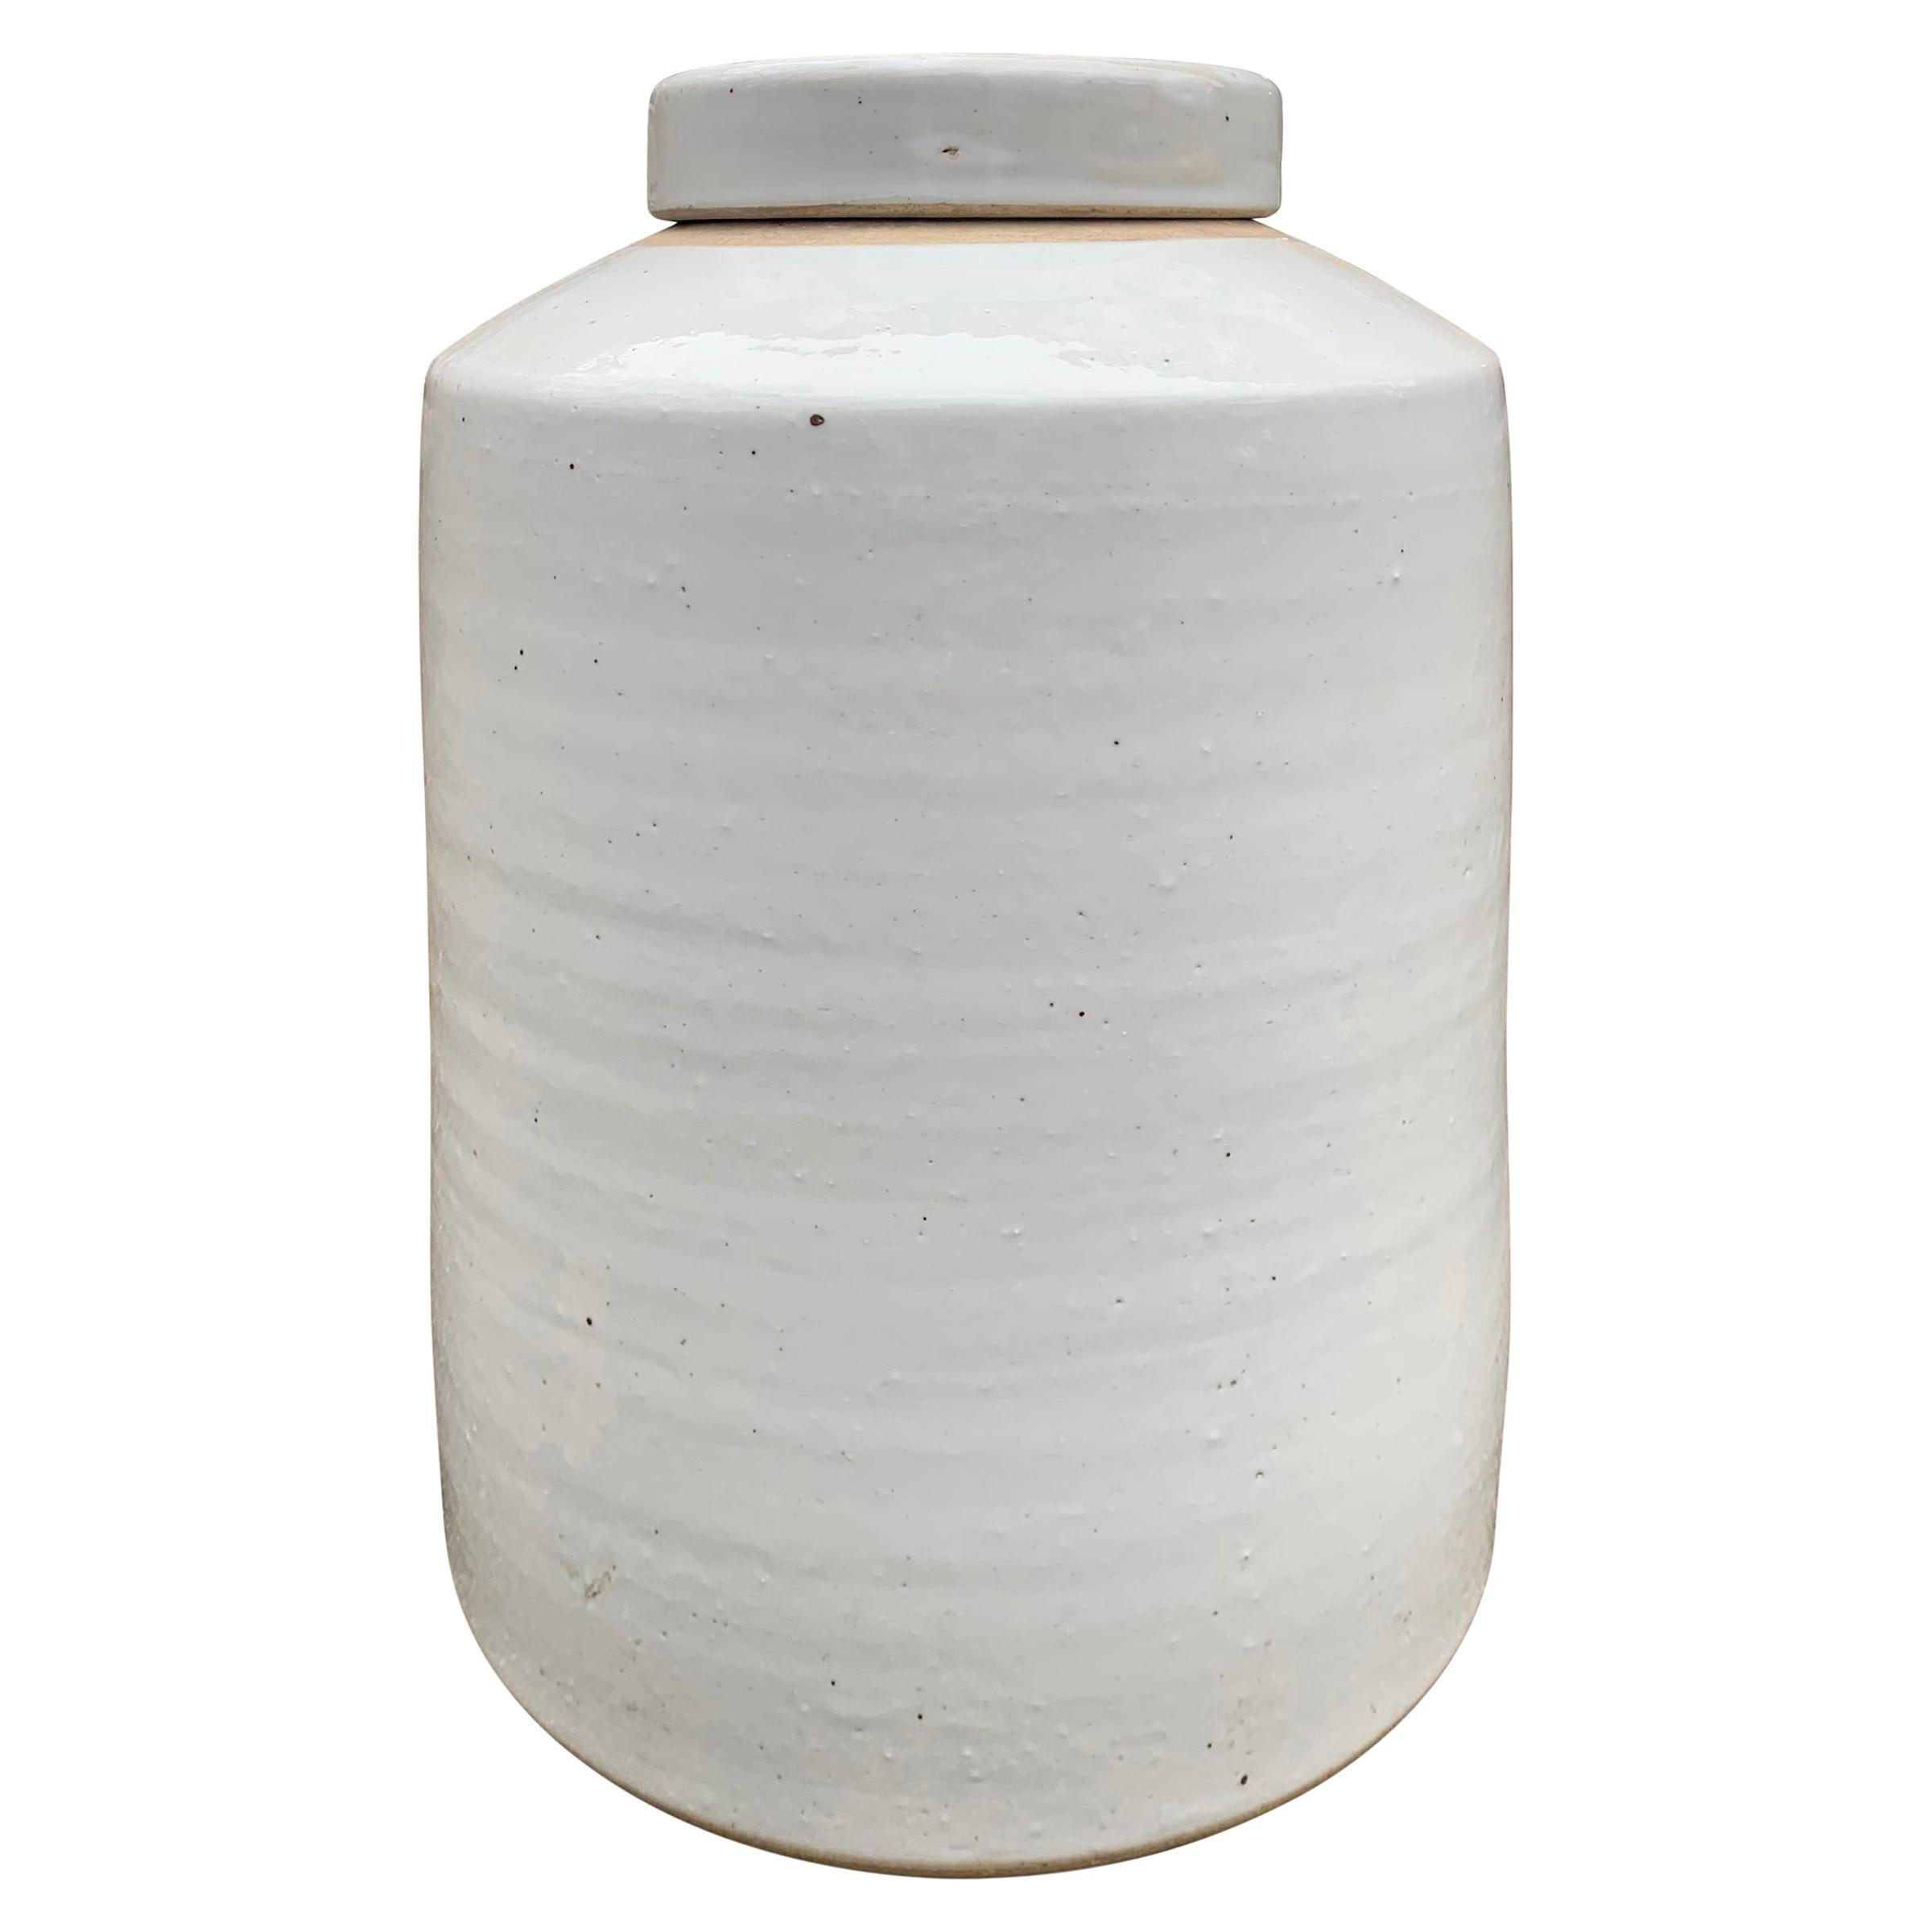 Chinese White Glazed Ginger Jar